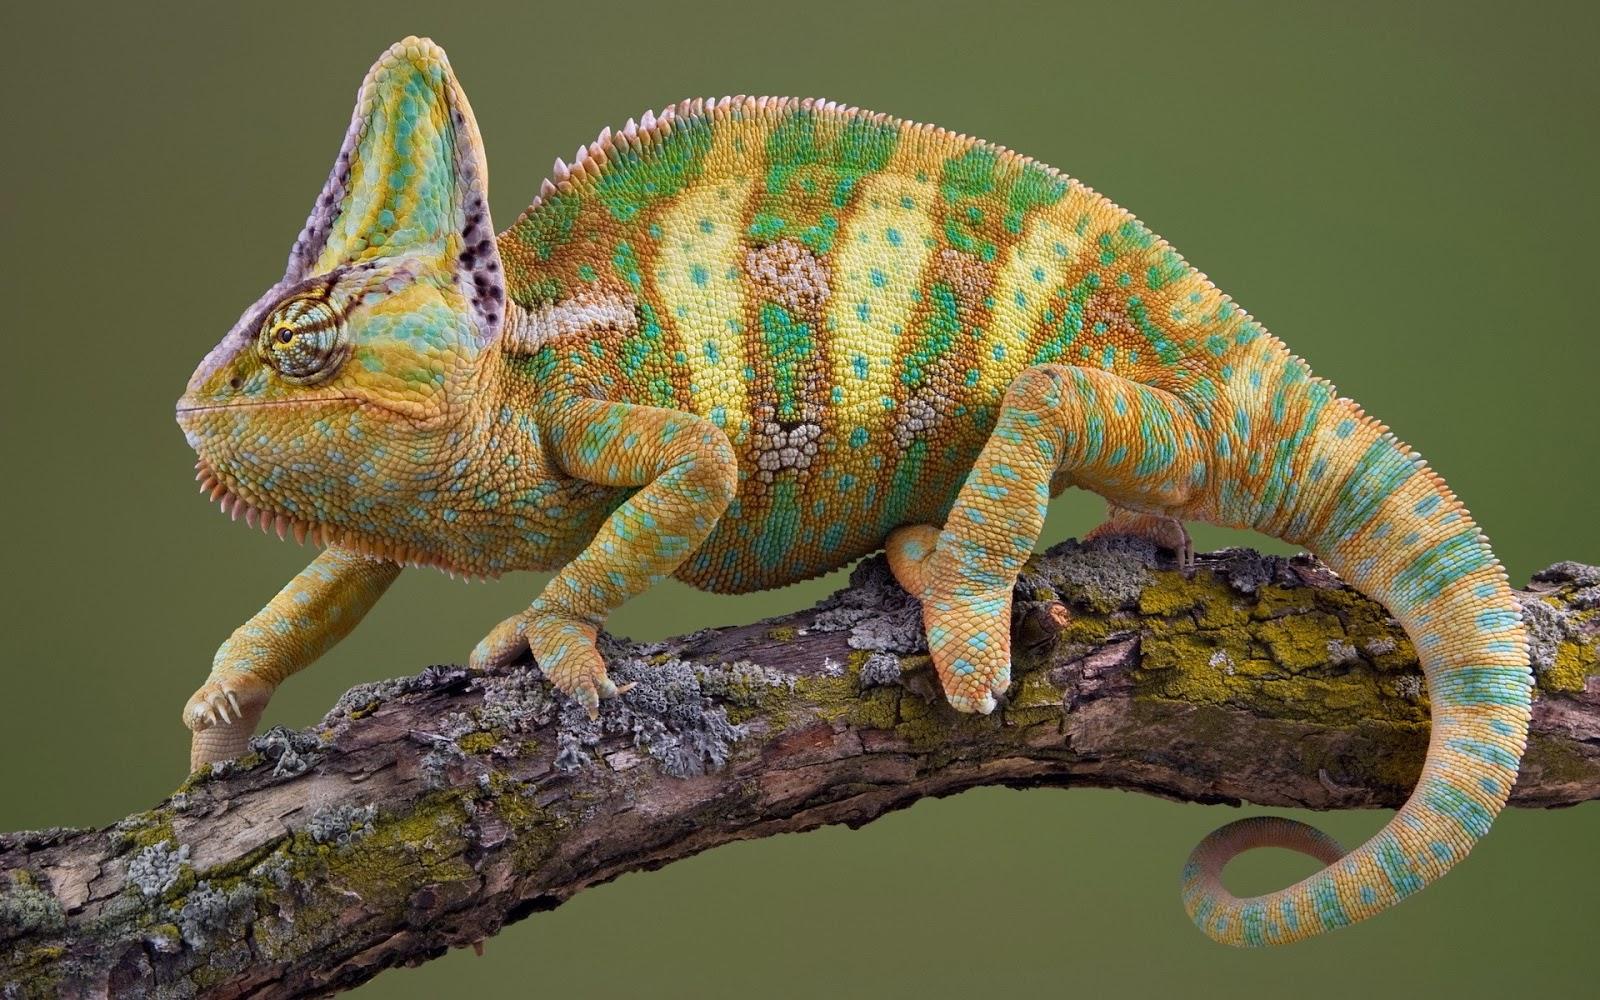 striped chameleon wallpaper hd - photo #18